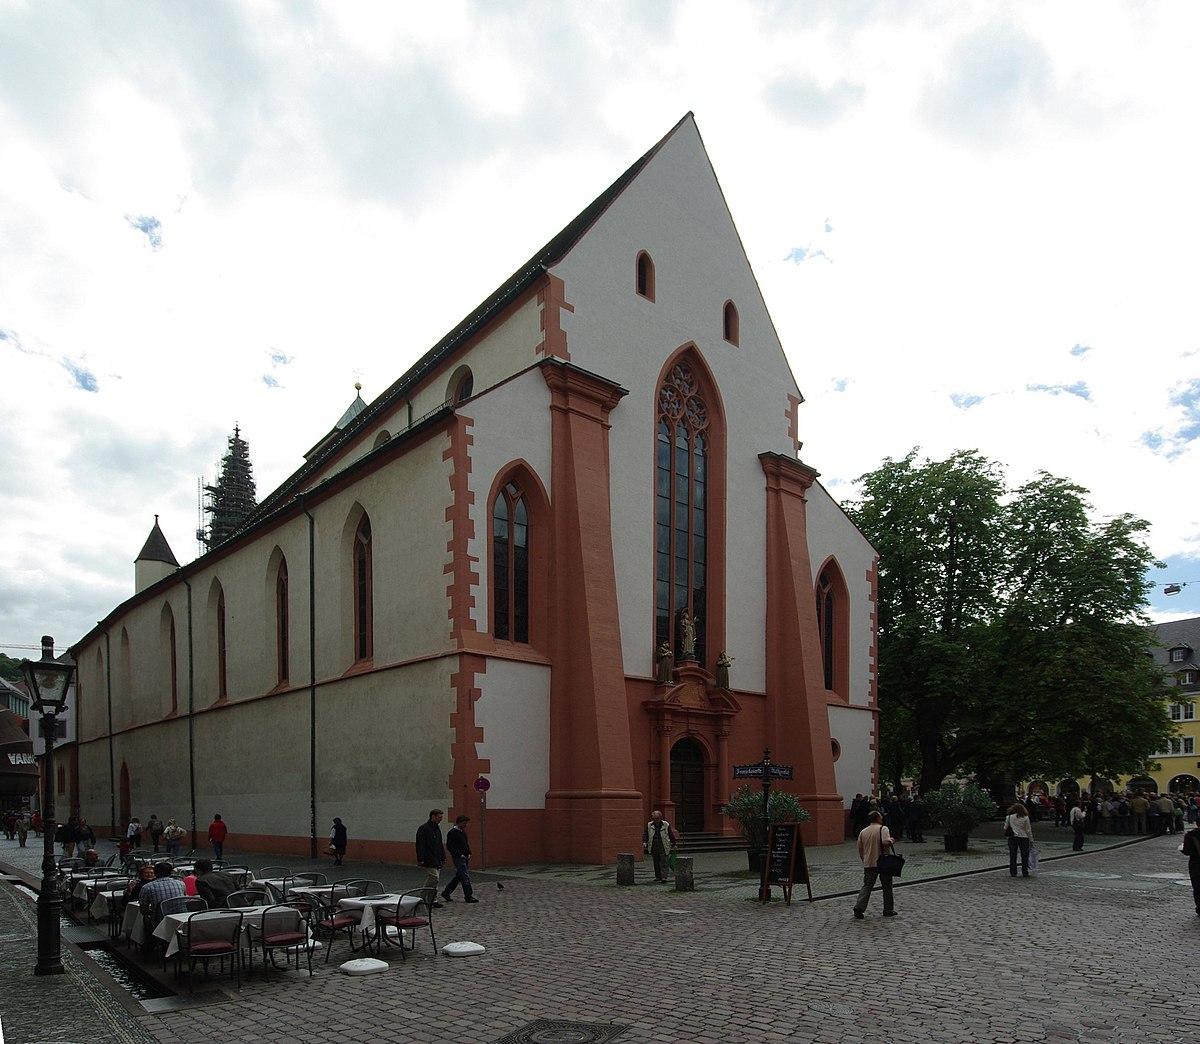 Where Is St Martin >> St. Martin (Freiburg-Altstadt) – Wikipedia